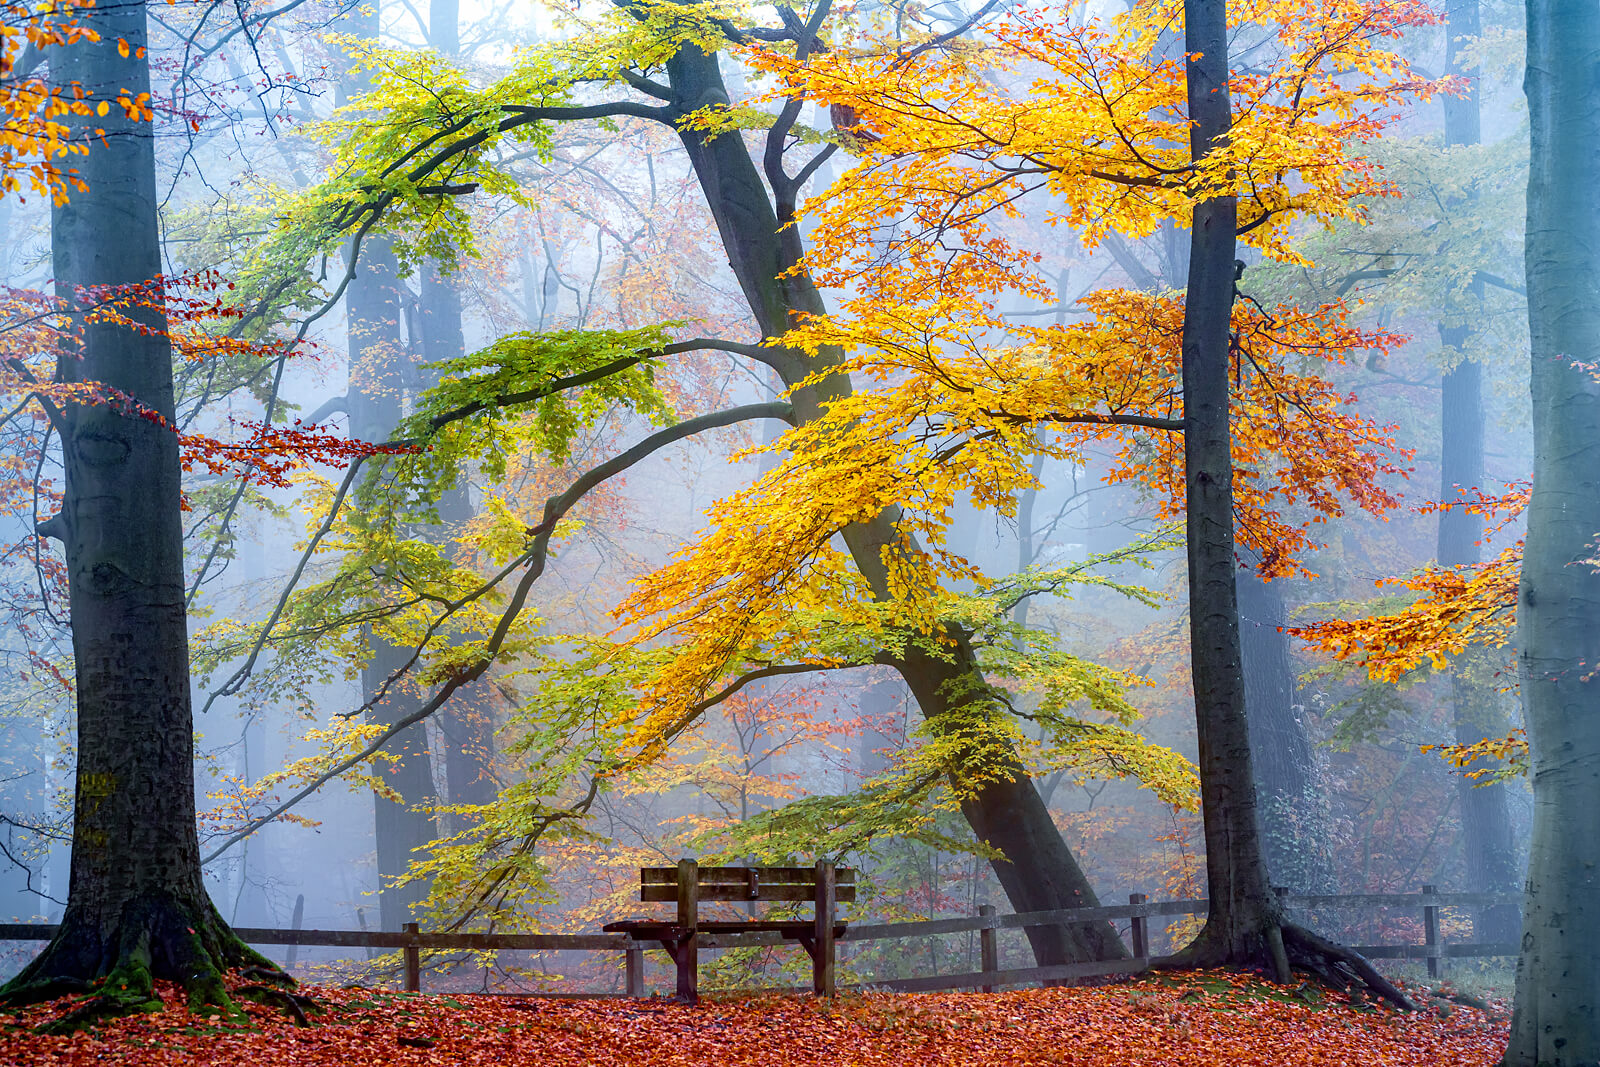 Take a Seat and Enjoy II